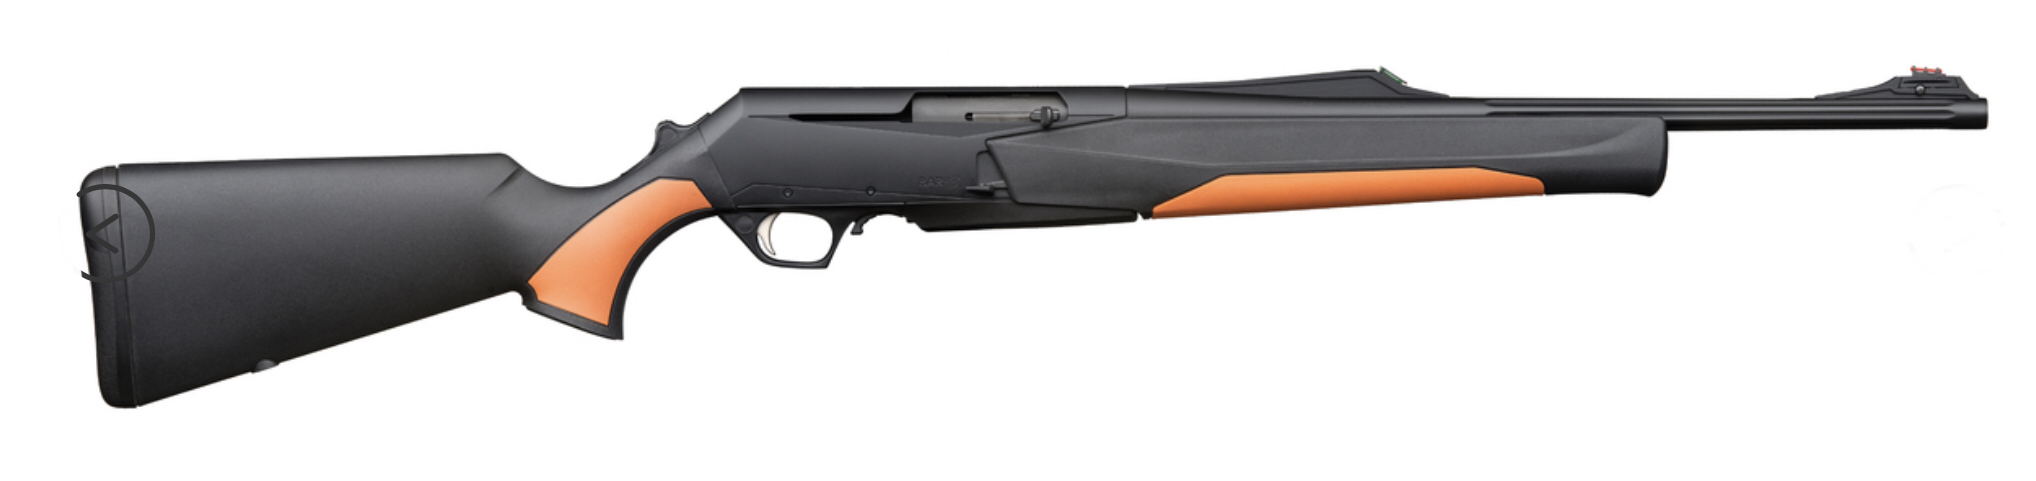 Browning Bar MK3 Tracker